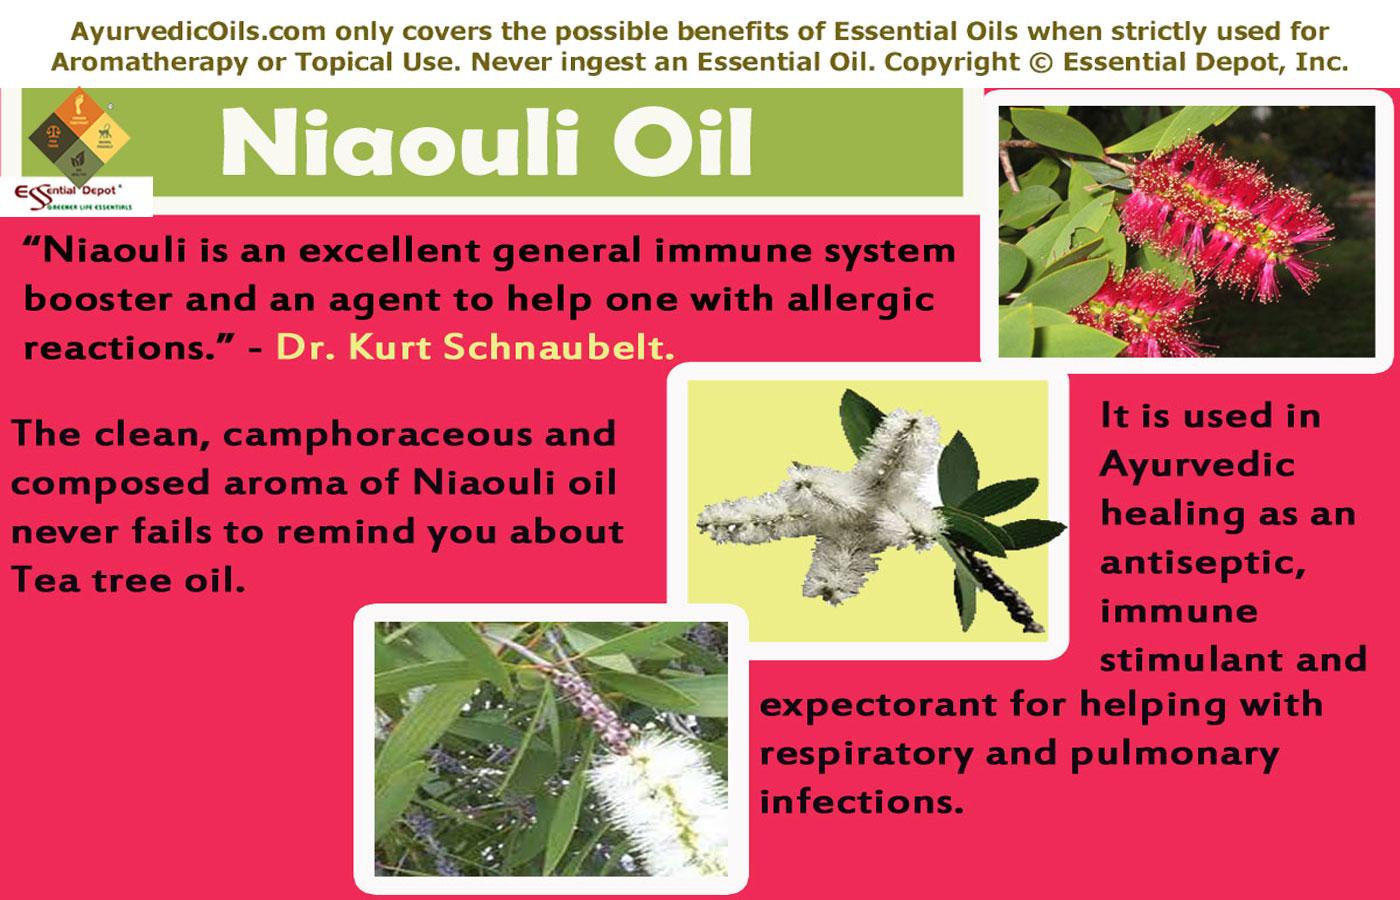 mildest essential oils